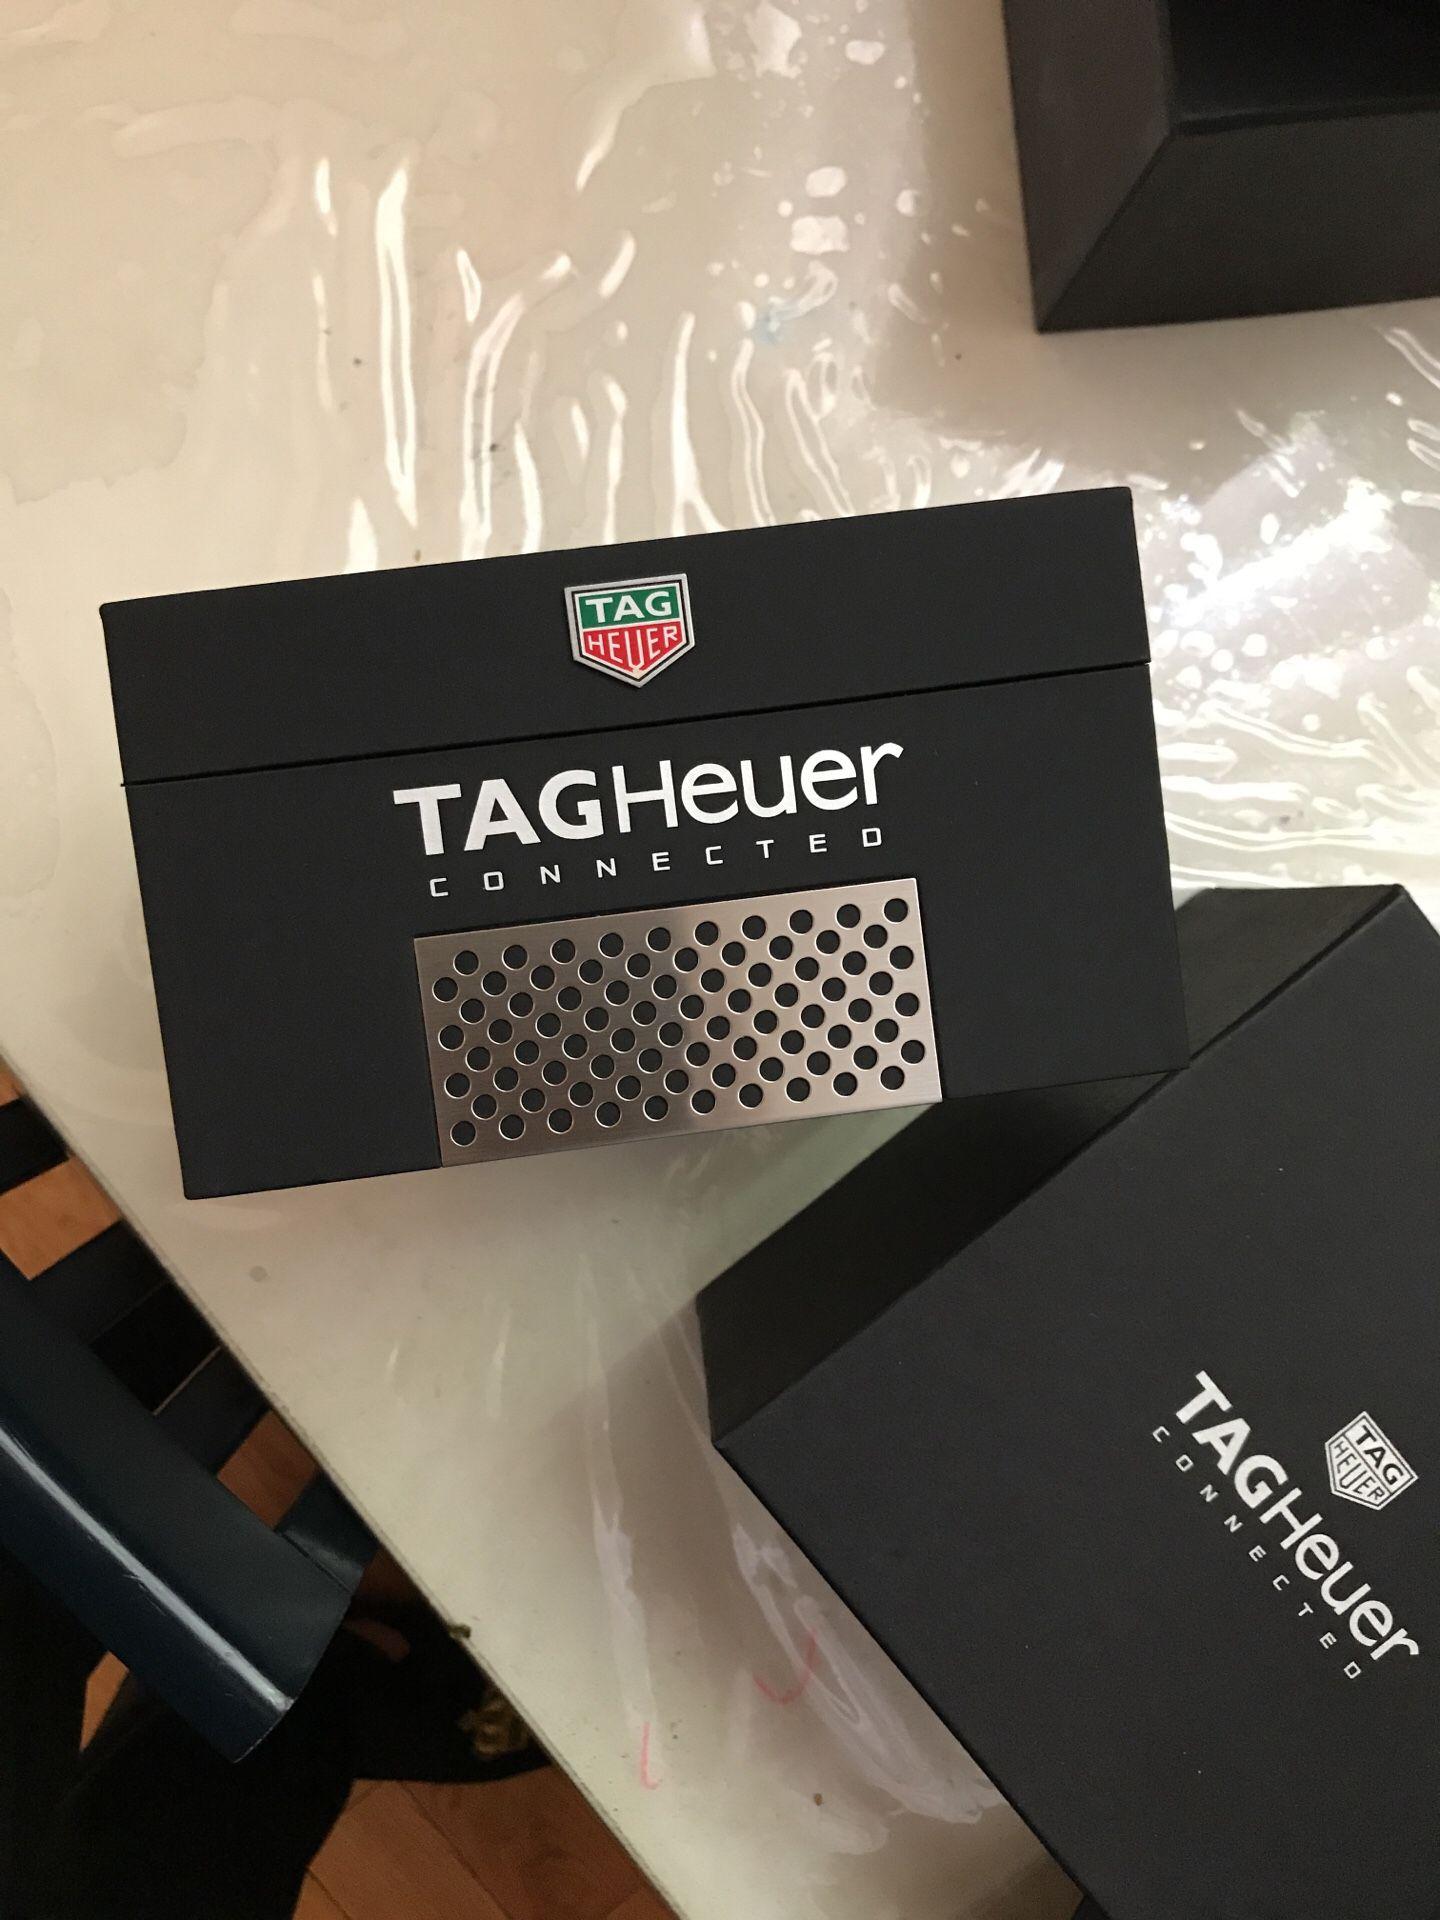 Brand new TagHeuer watch